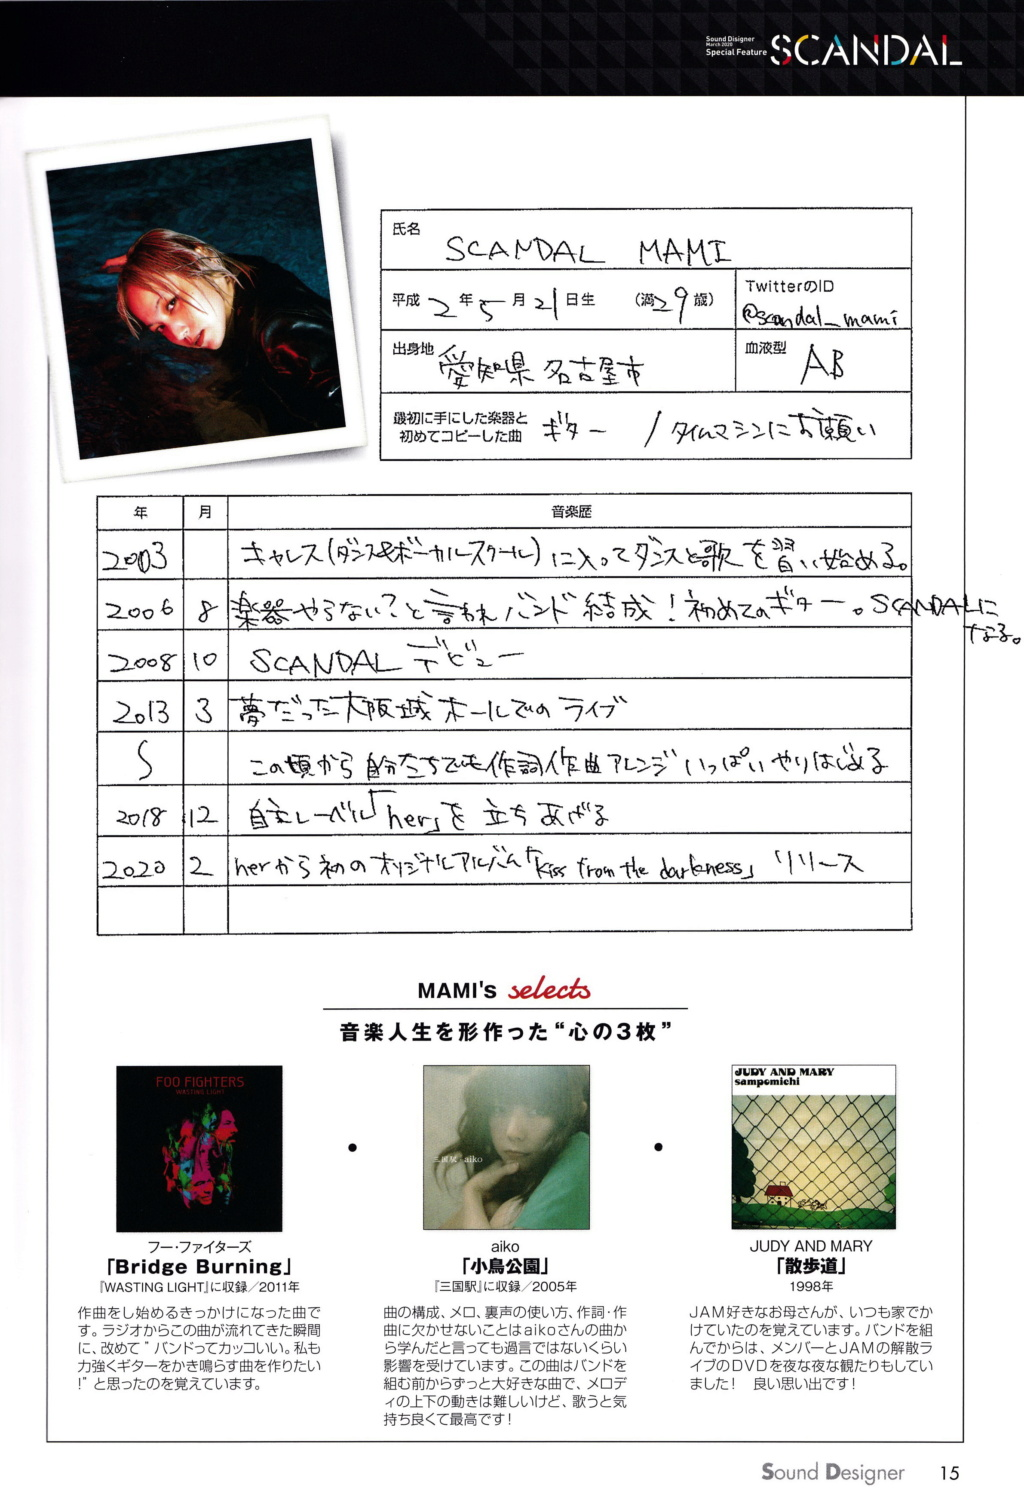 SOUND DESIGNER Img_0043